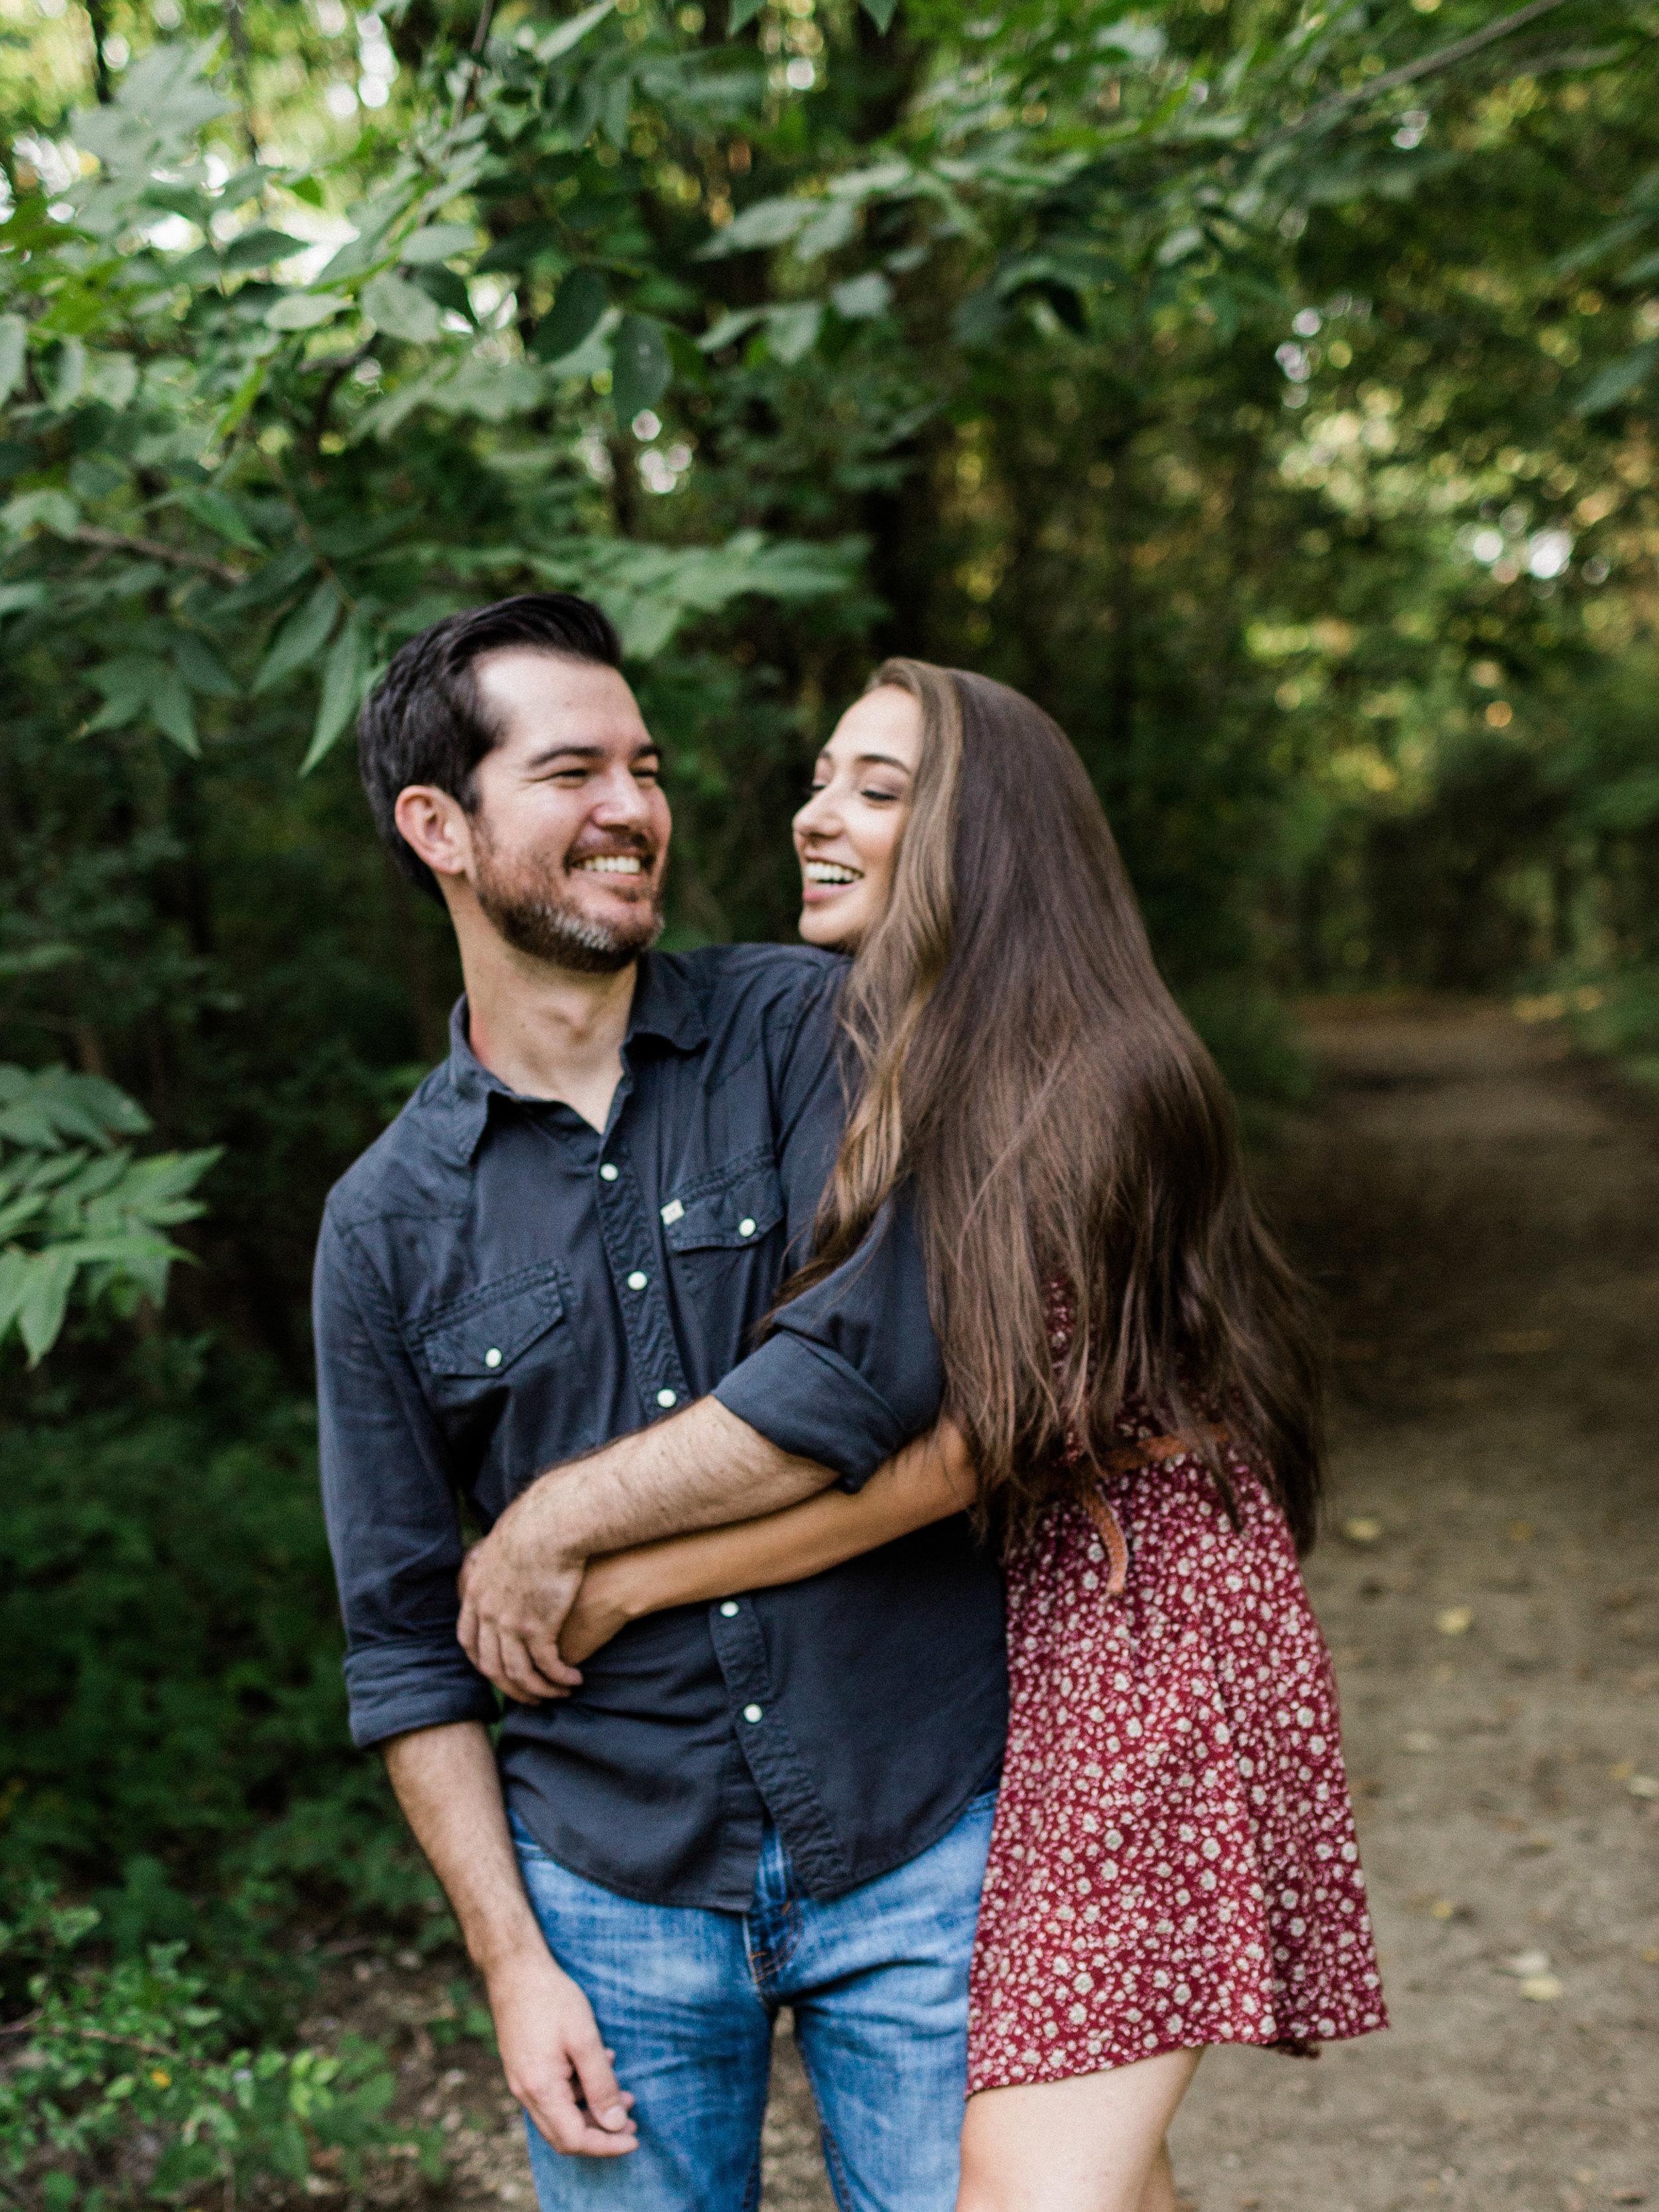 Plano, Texas Engagement Photos